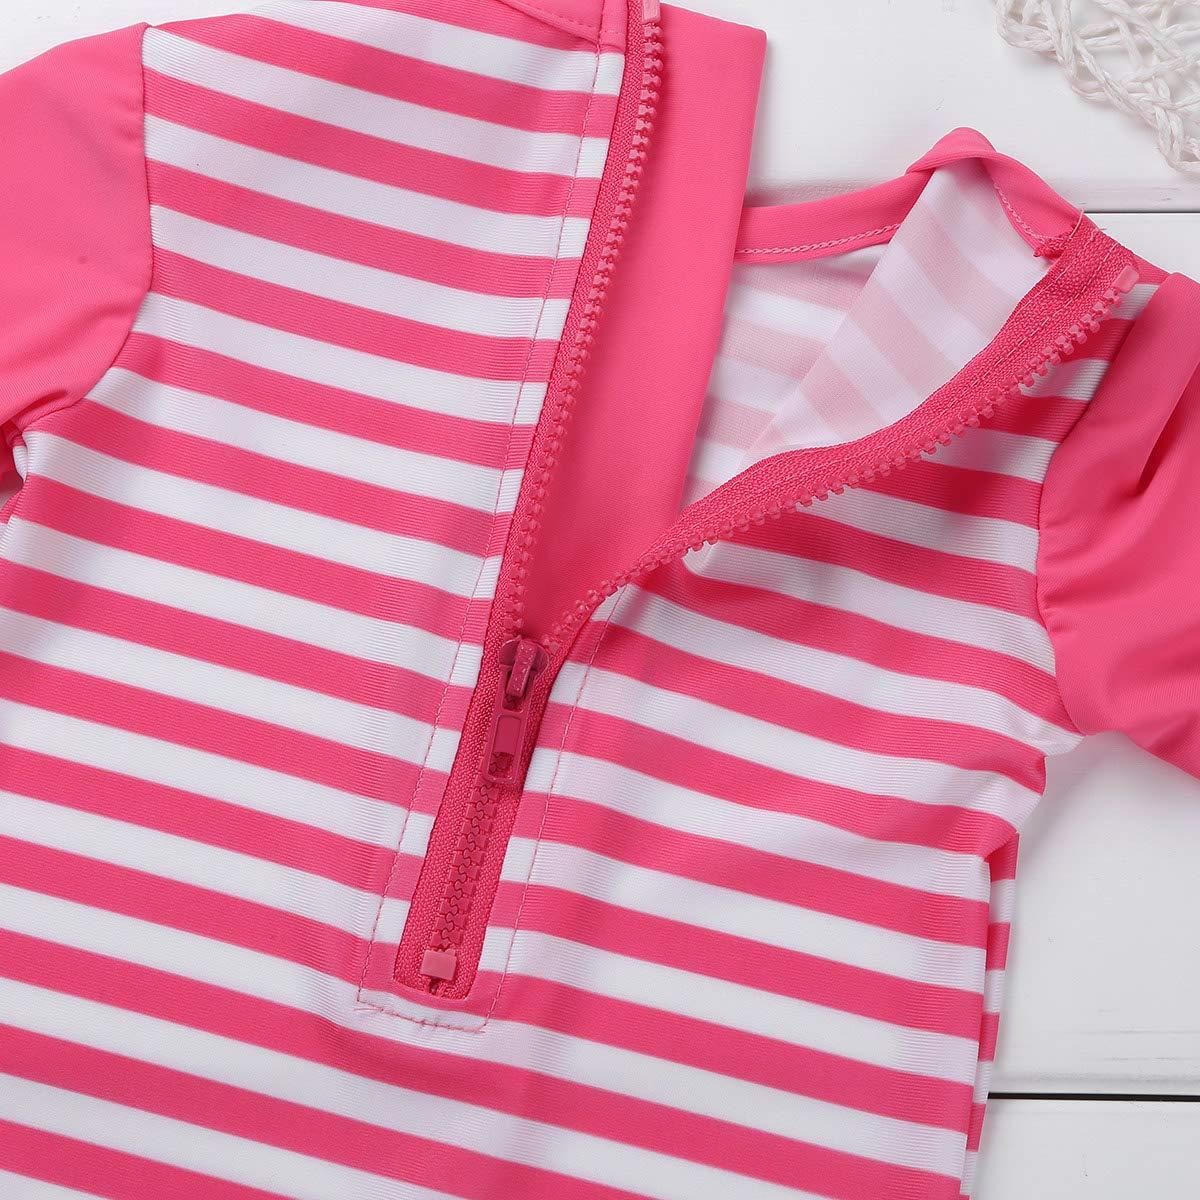 One Piece Rash Guard Swimsuit iEFiEL Little Baby Girls Long Sleeve Zip Sunsuit UPF 50